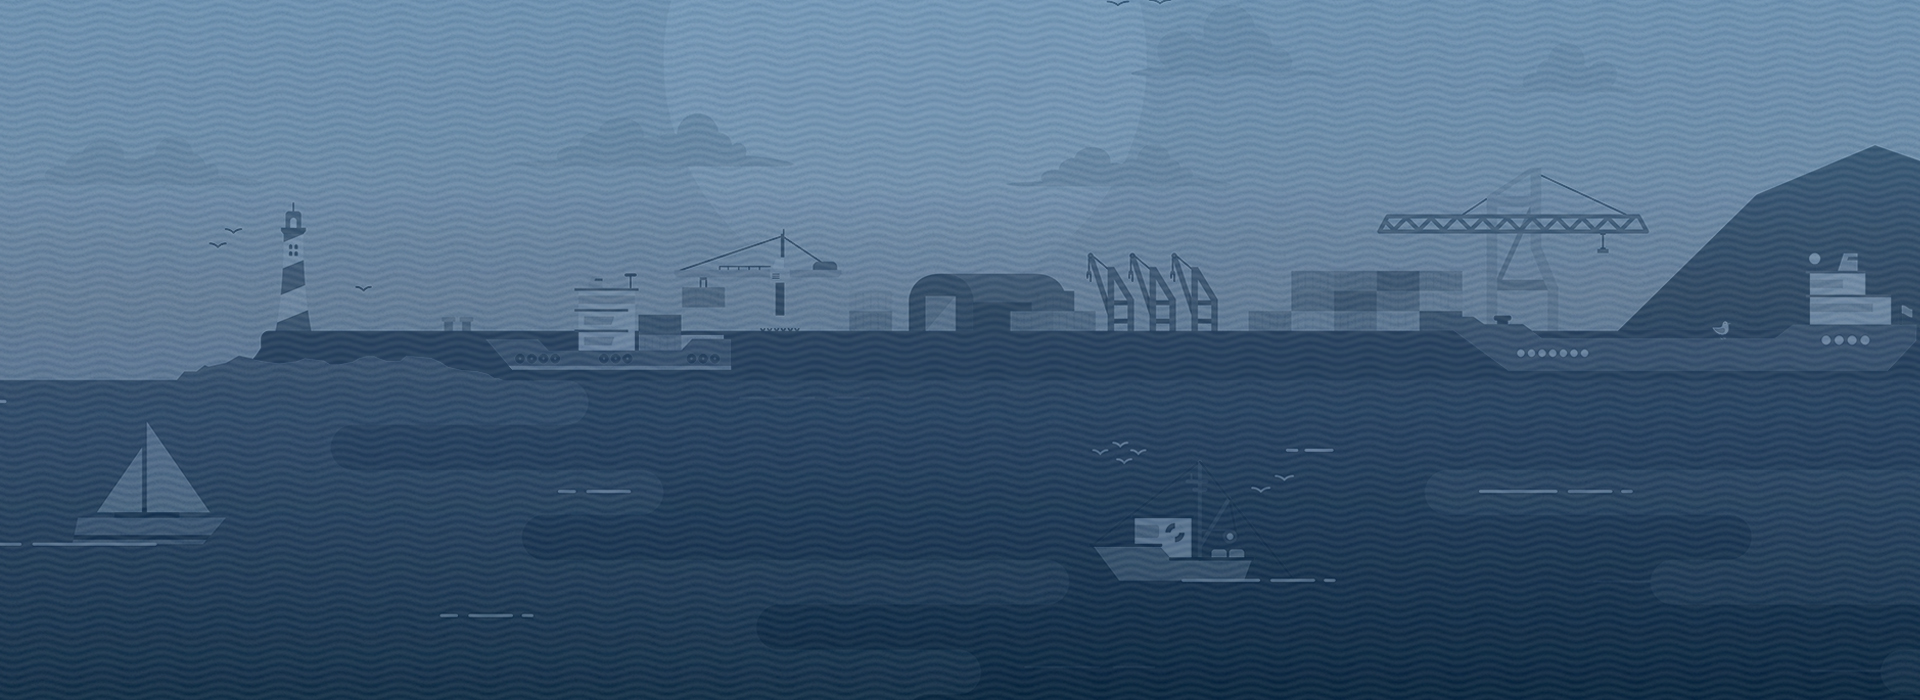 https://www.maritimesuper.com.au/sites/default/files/revslider/image/Web_Banner_Annual-Statement.jpg